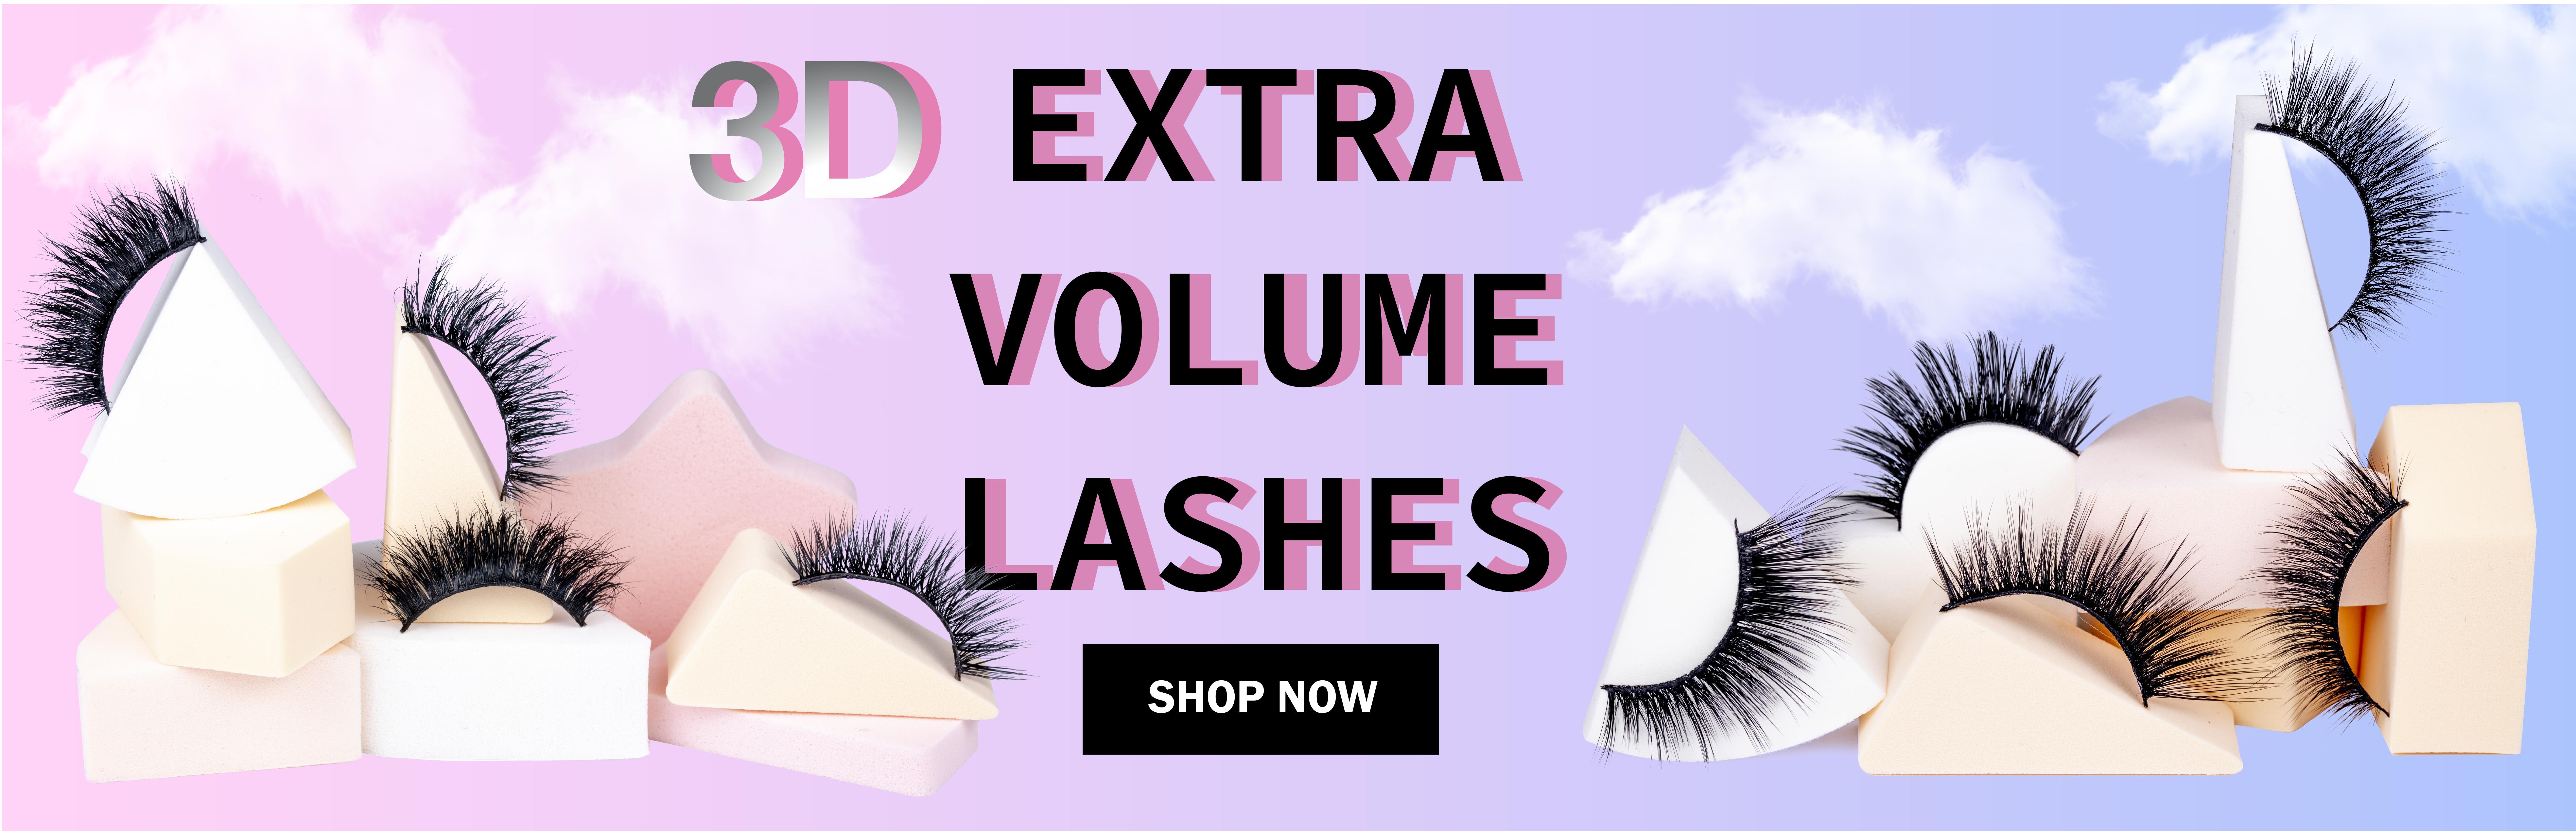 3D Extra Volume Lashes